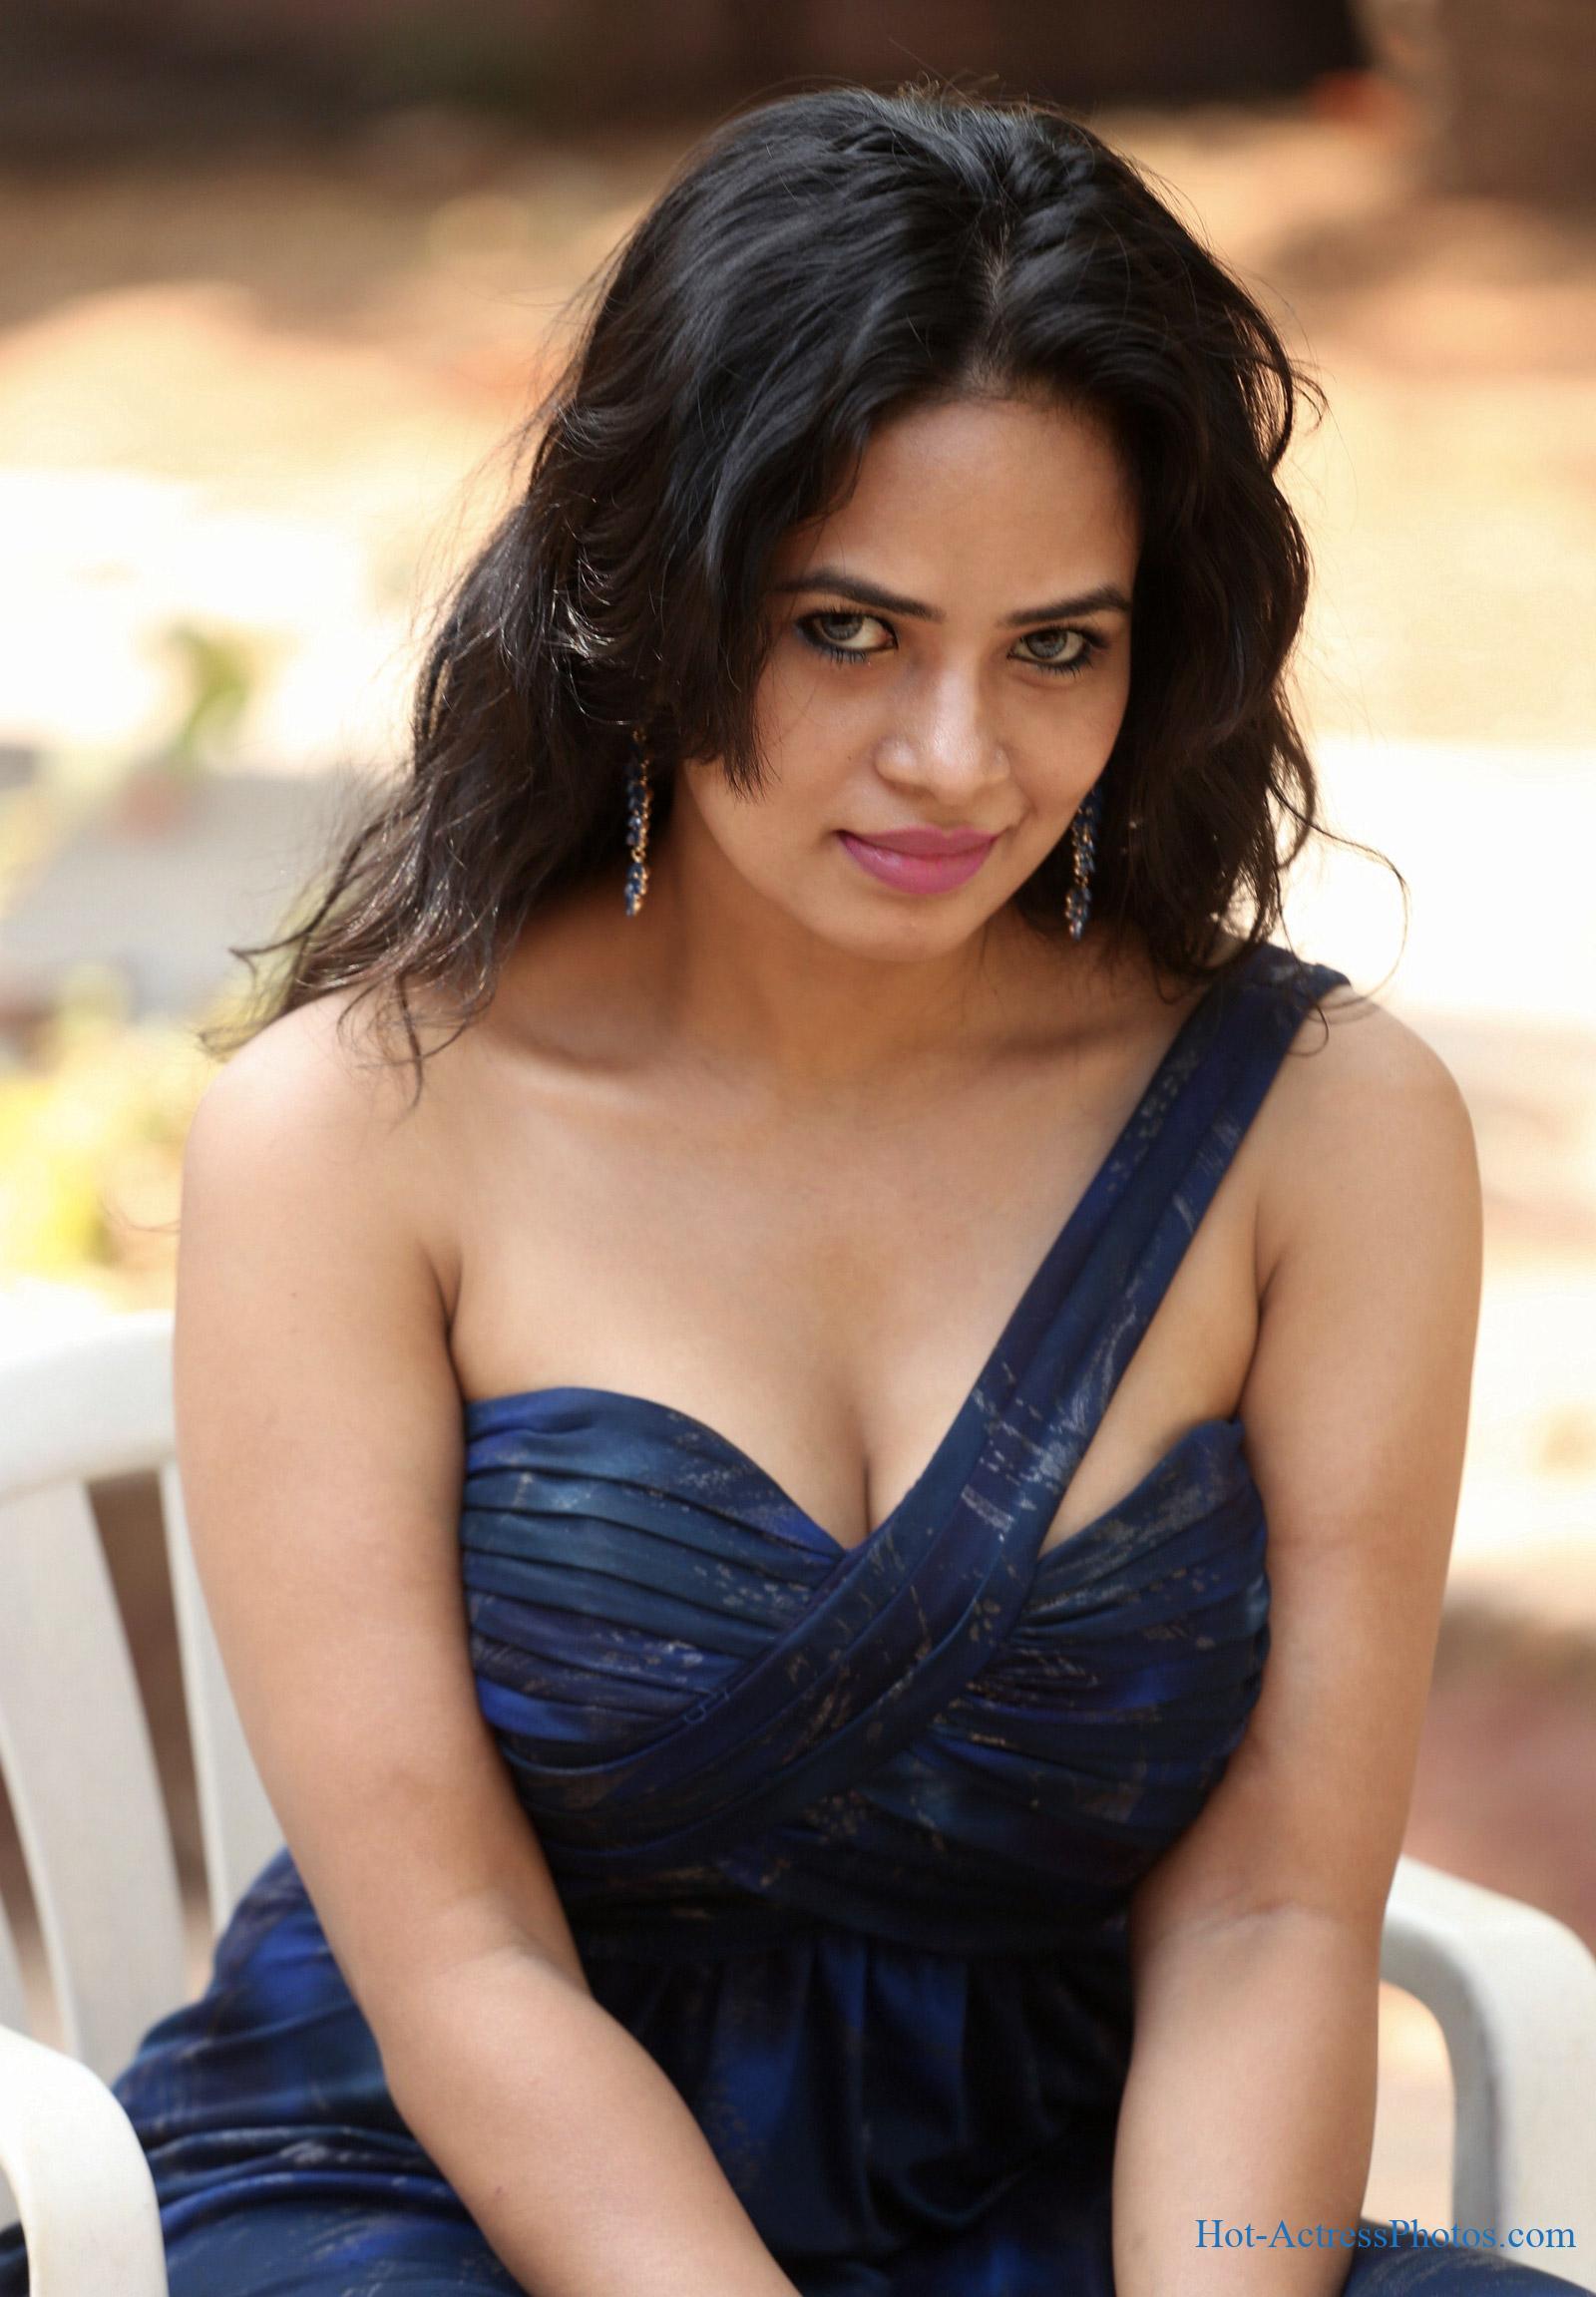 Minakkshi Kalitaa Hot Cleavage Photos At Satyam Movie Launch